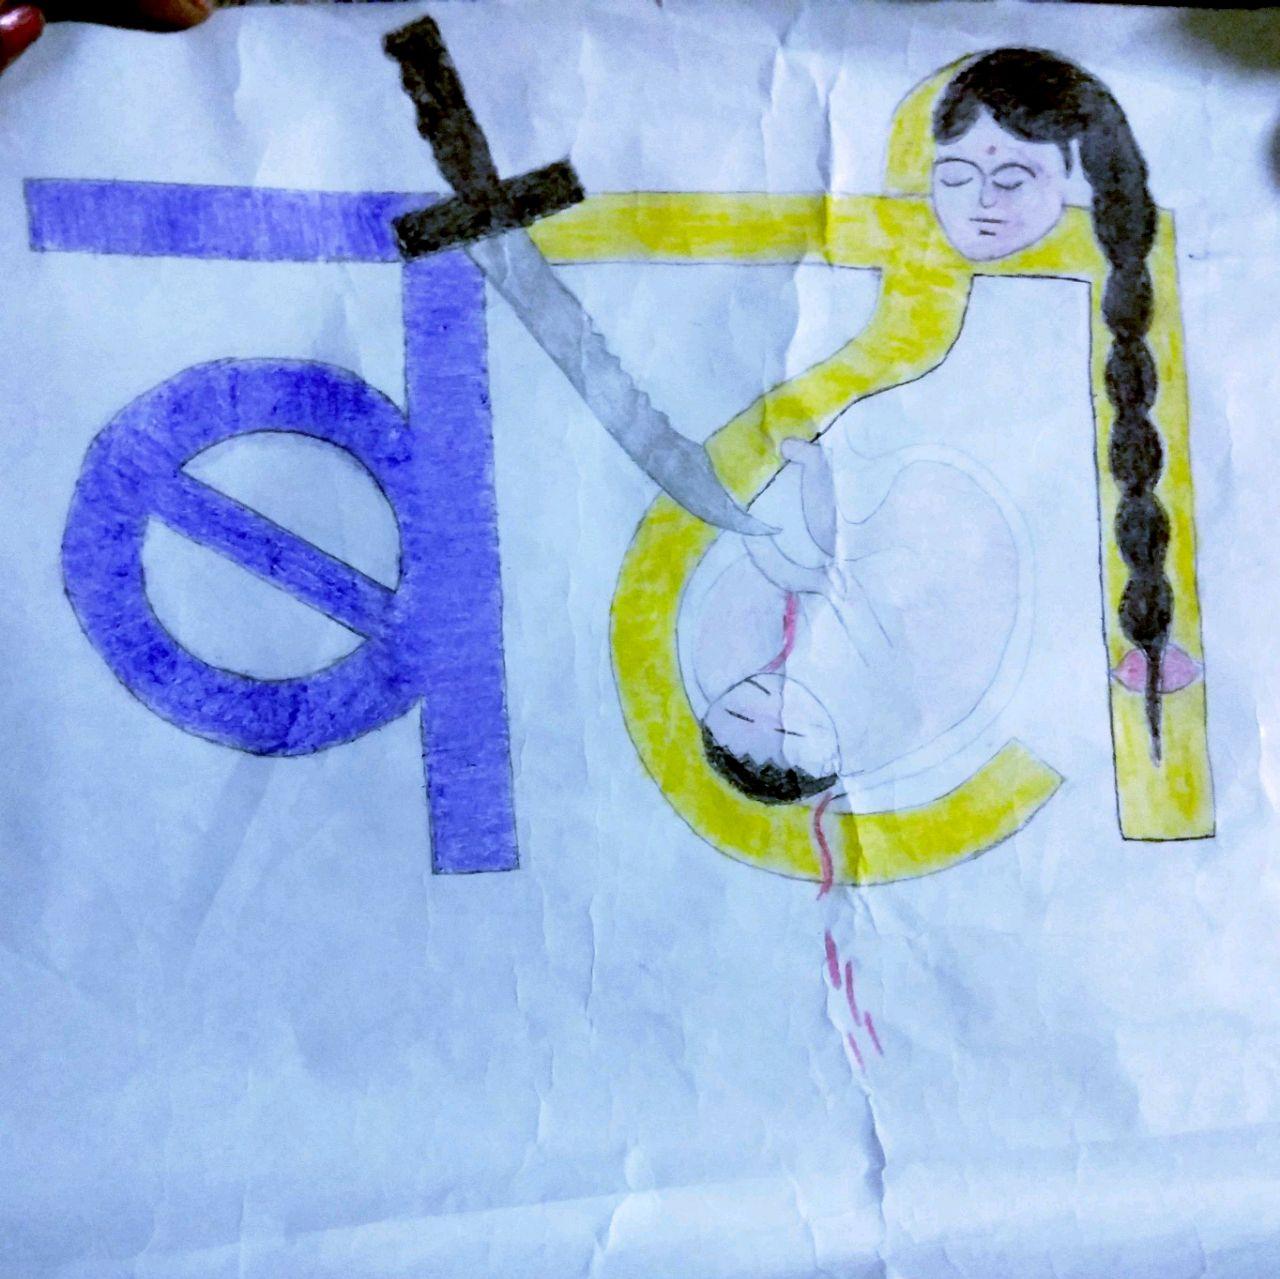 Sister S Talent Art Beti Bachao Beti Padhao Pr Nojoto